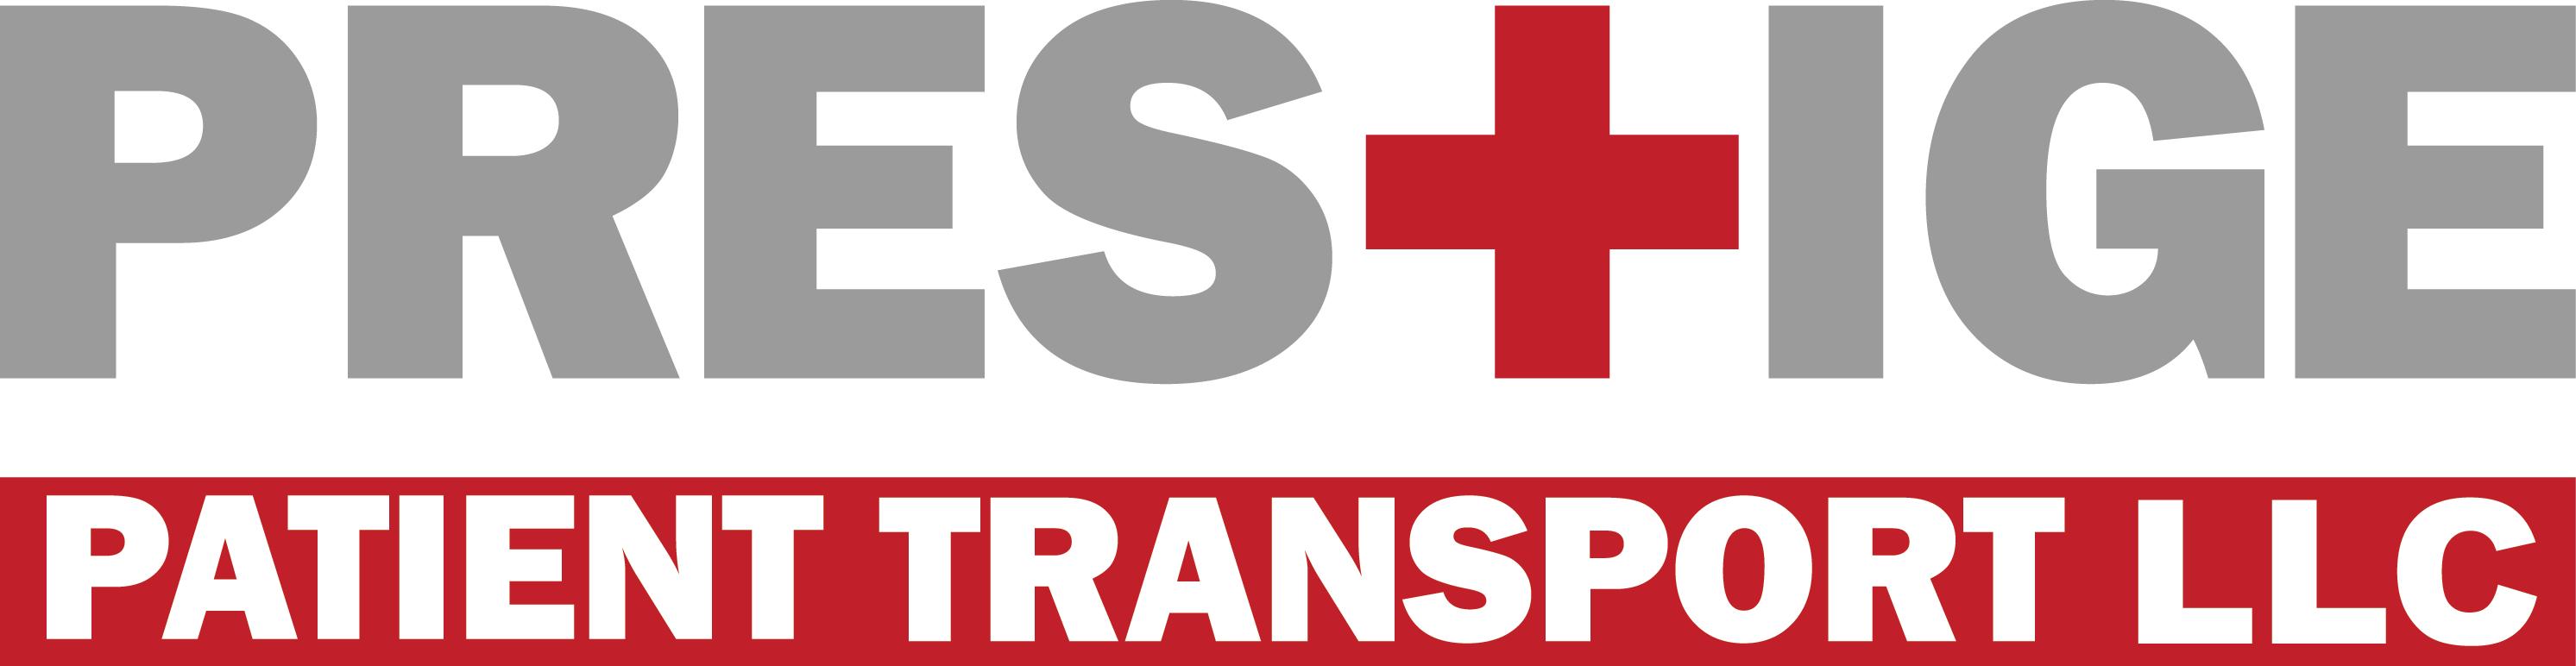 Prestige Patient Transport